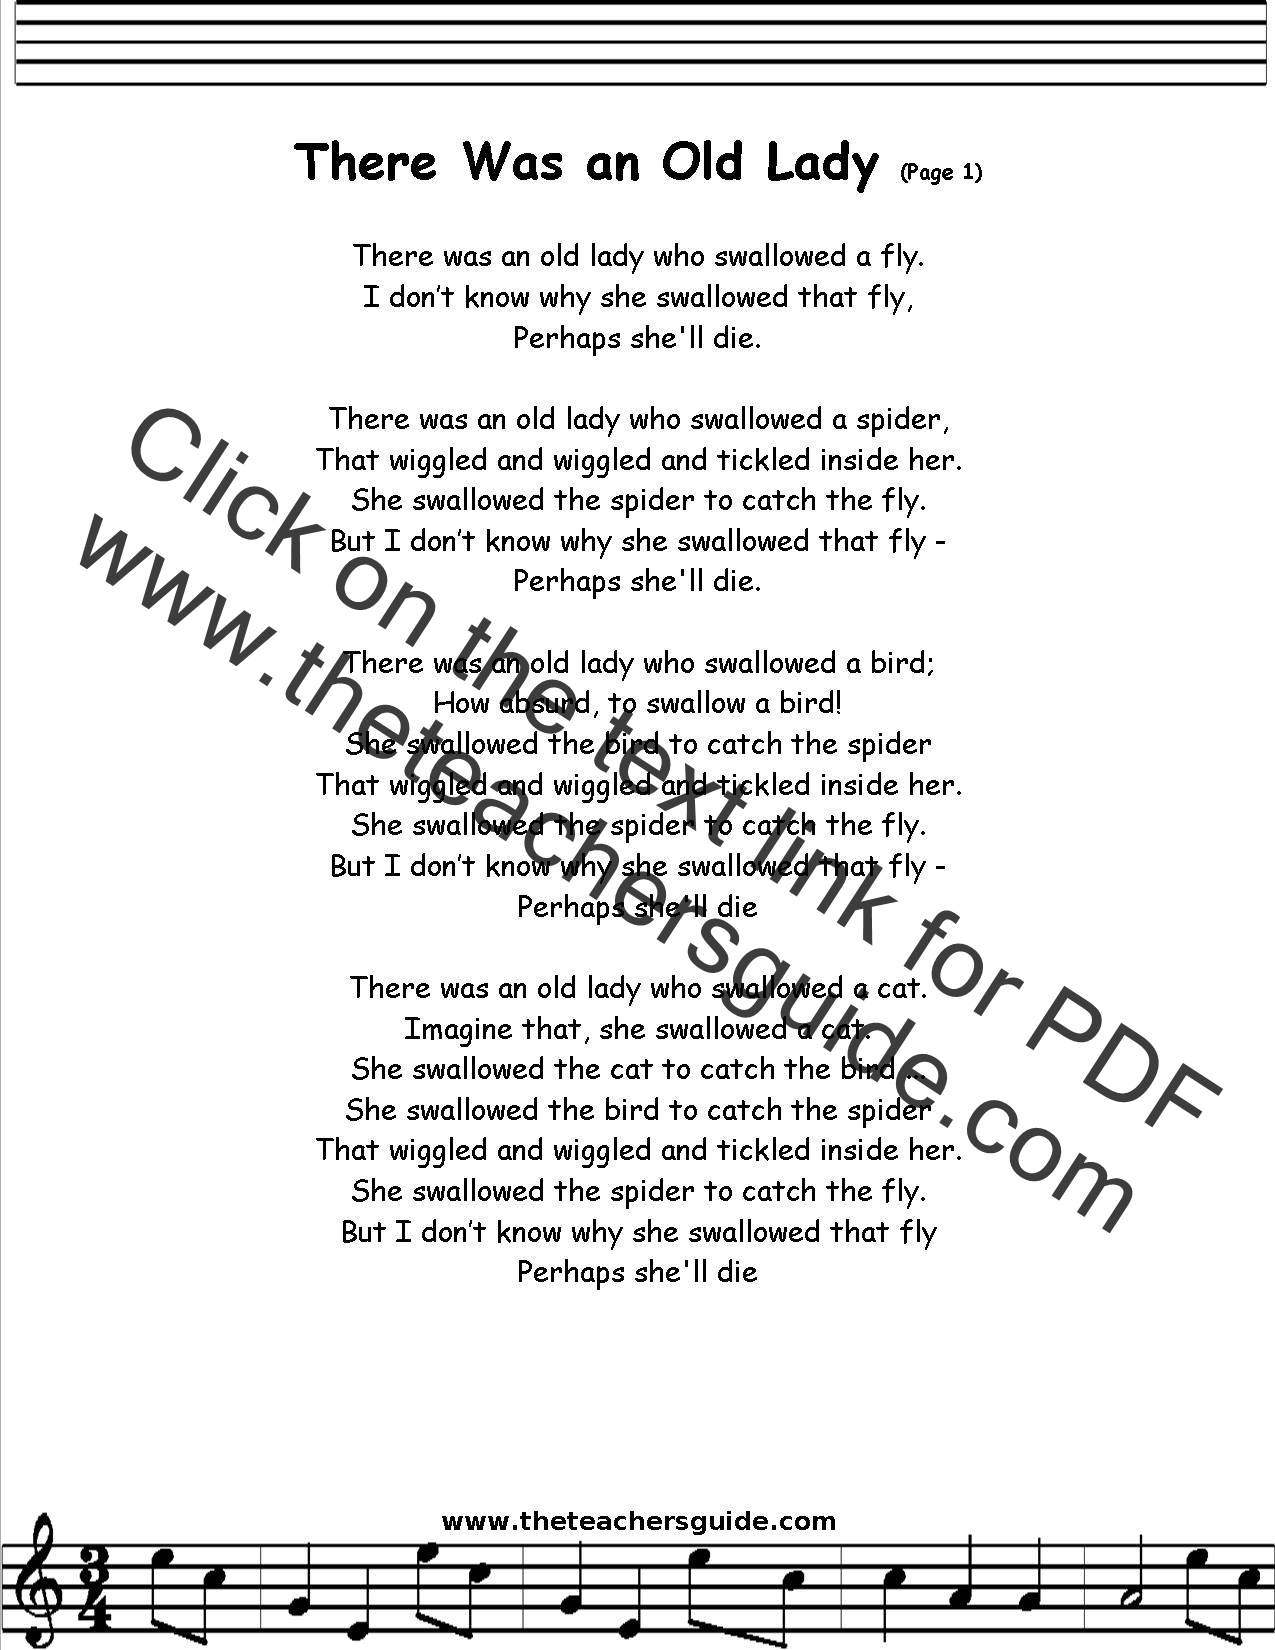 Ladybird song lyrics